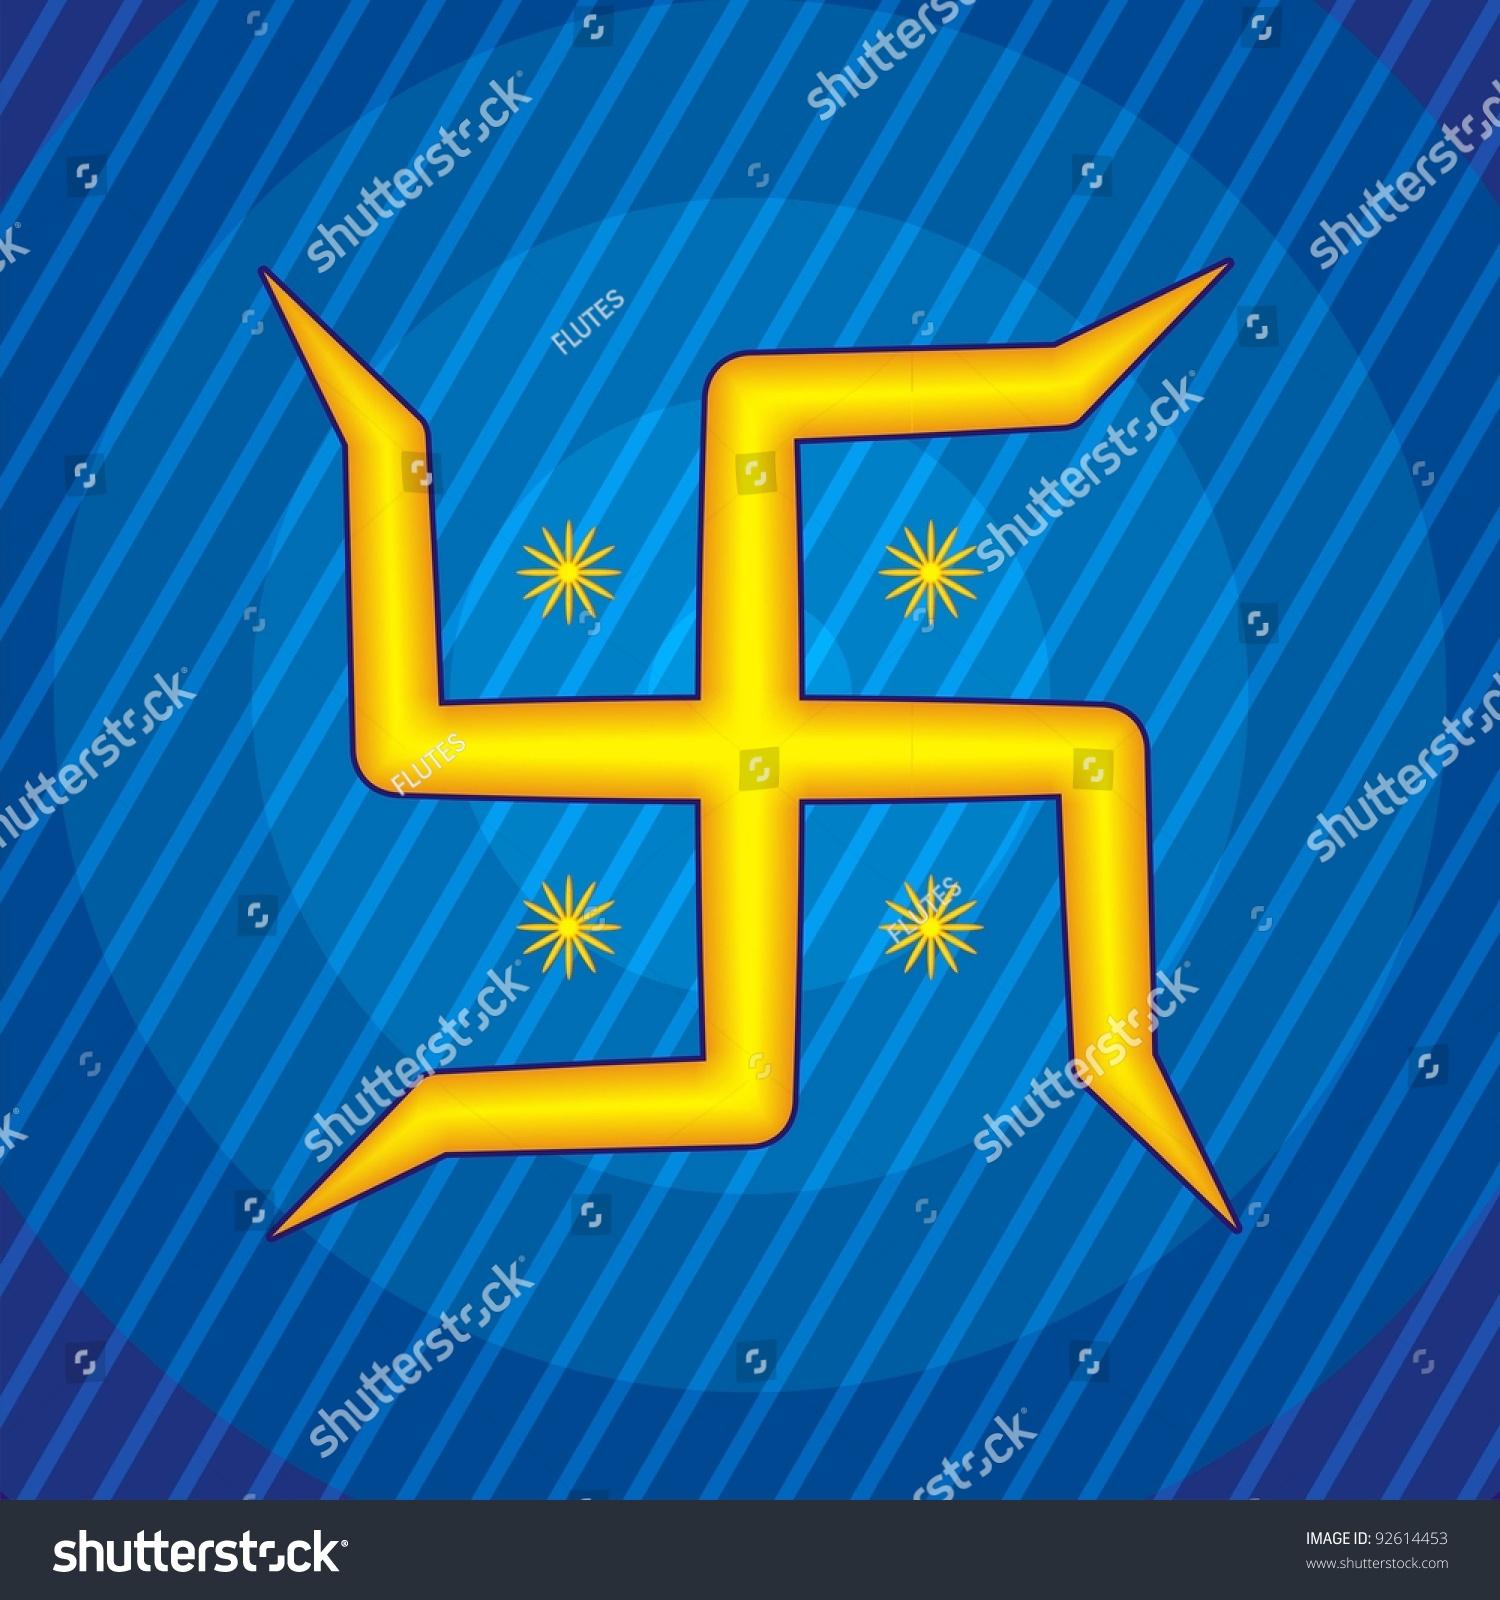 Indian Hindu Symbol Swastika Stock Photo 92614453 ...